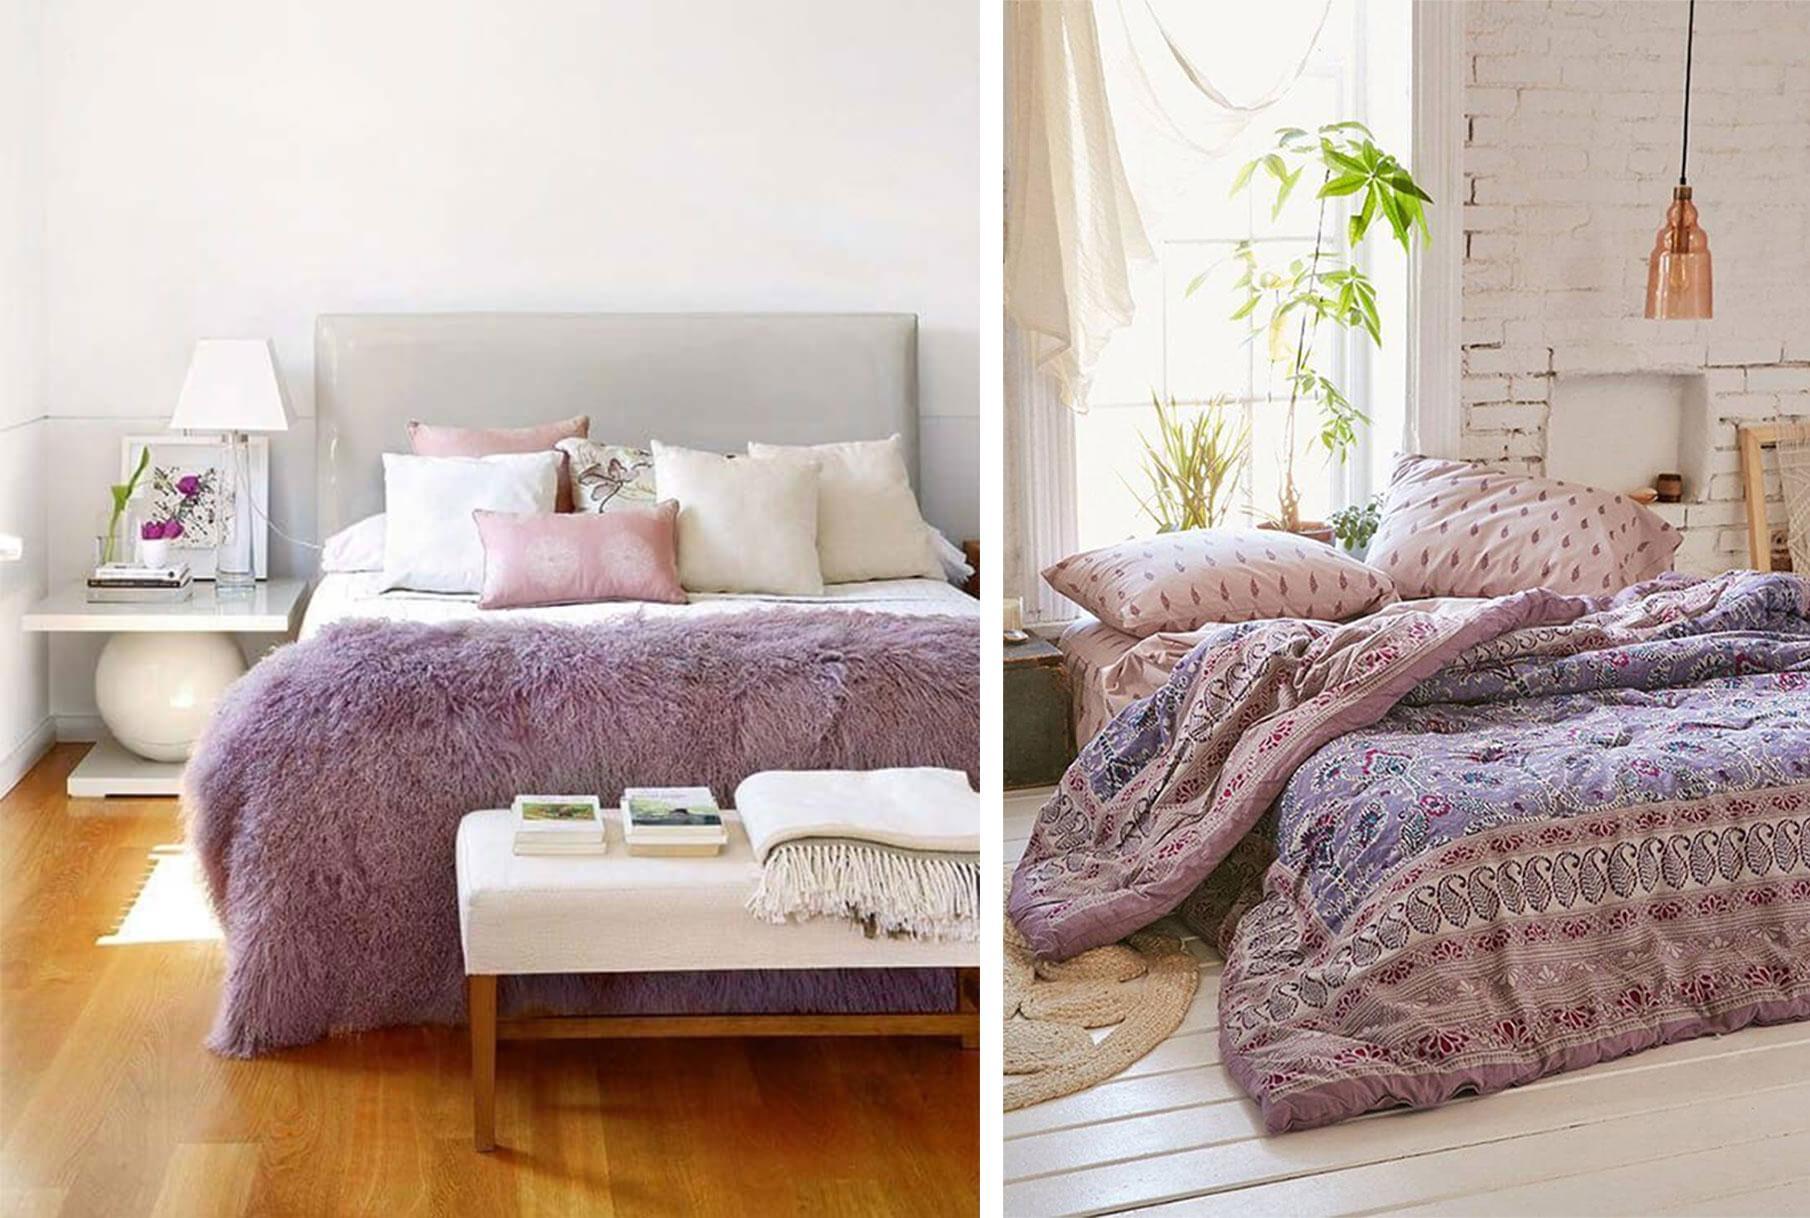 Glamorous grey bedroom with purple bedding